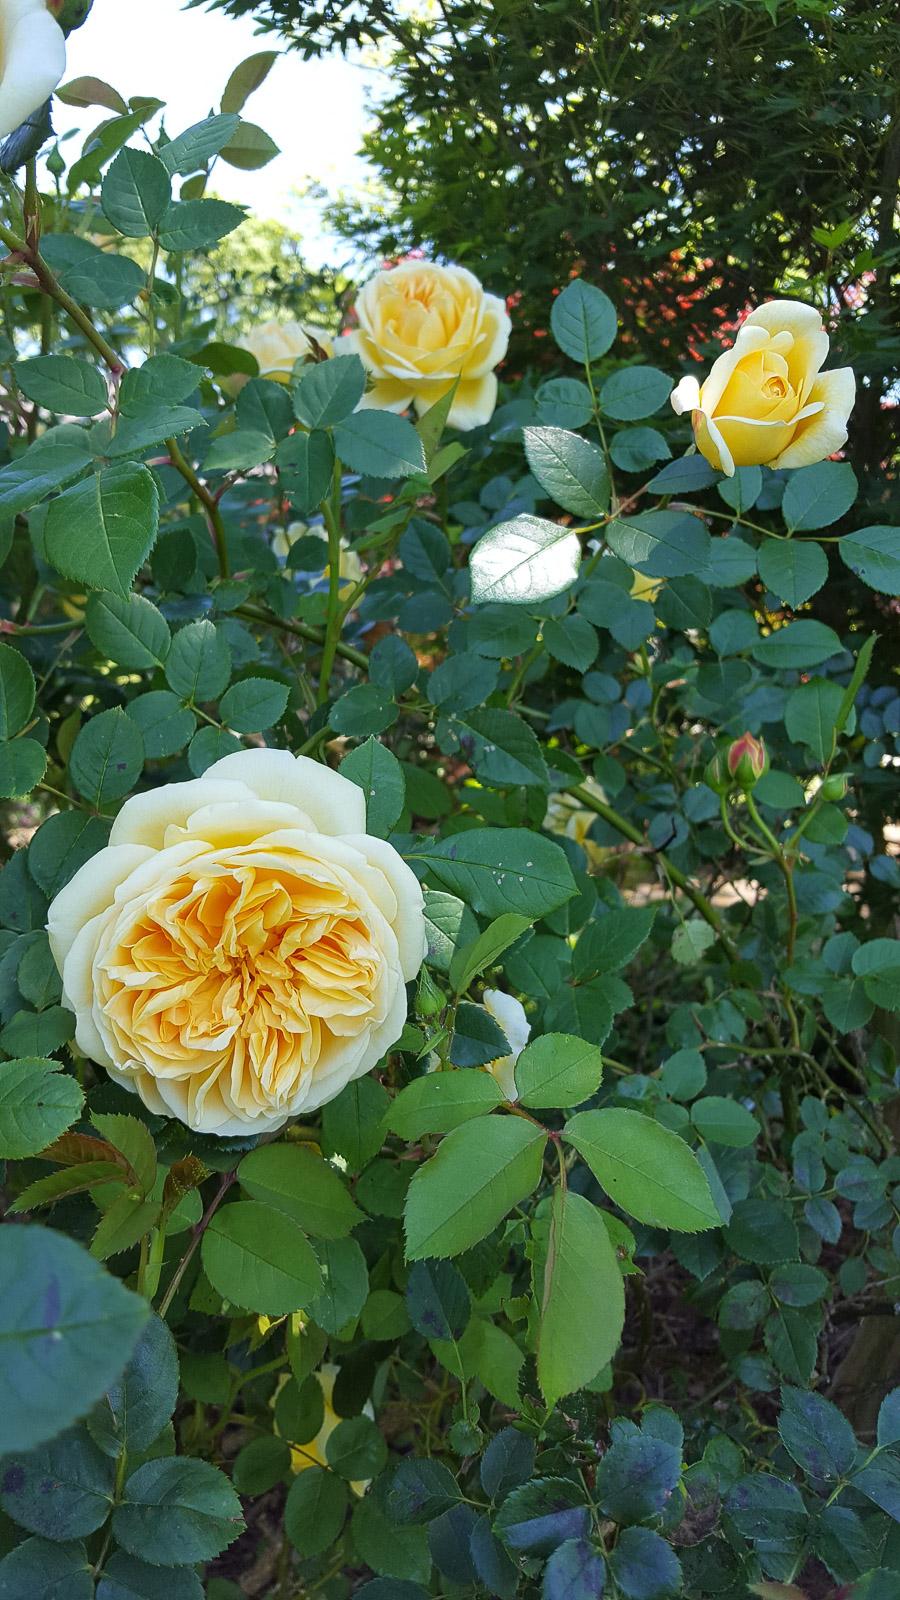 middendorf-yellow-rose (1 of 1).jpg